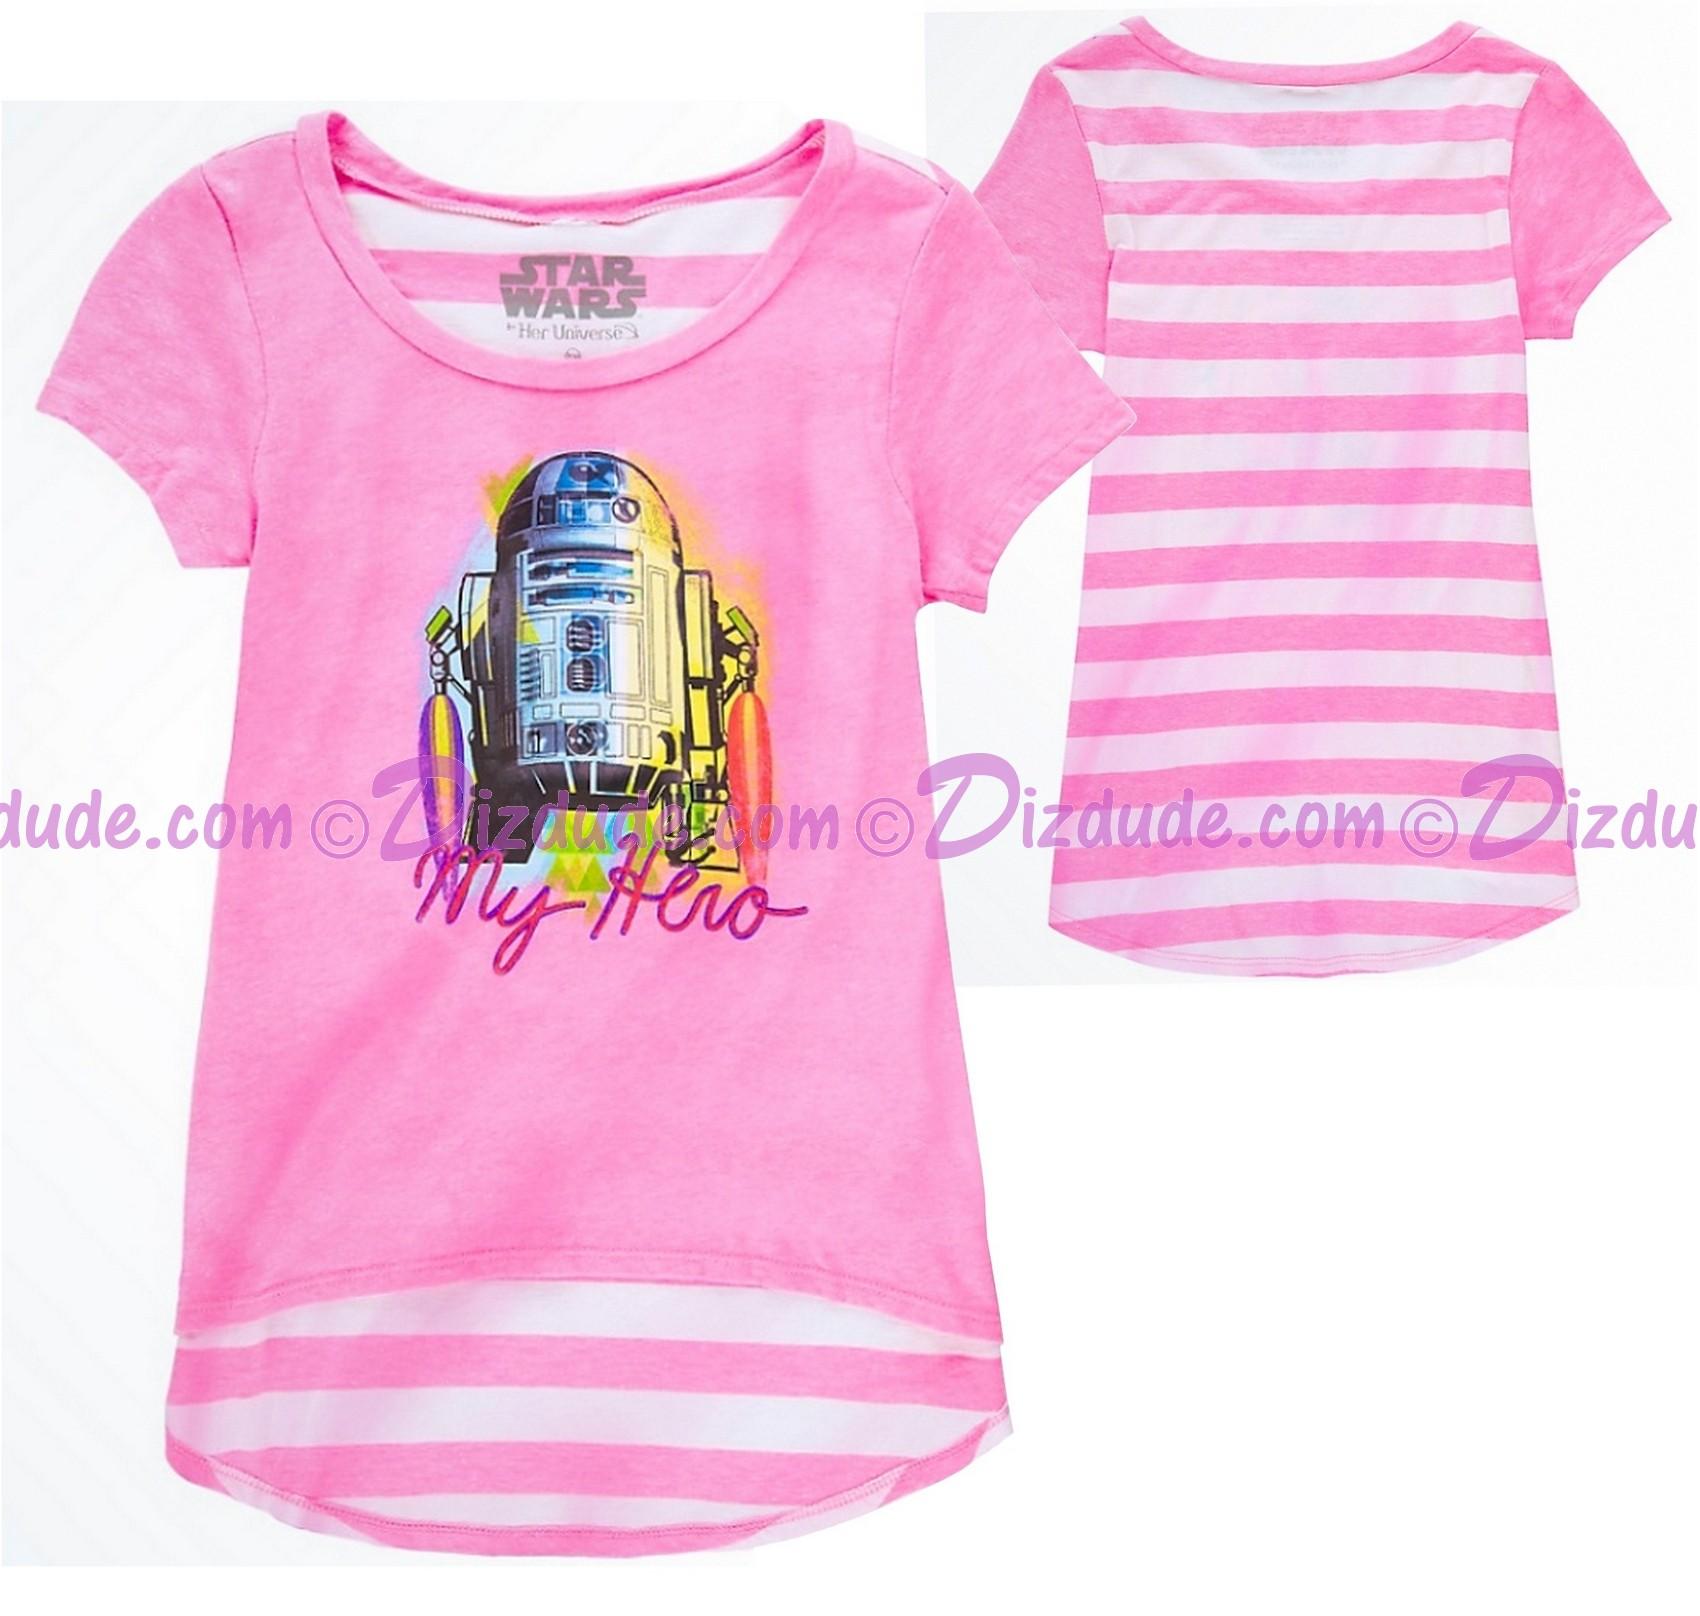 R2-D2 My Hero Youth T-shirt  (Tee, Tshirt or T shirt) - Disney Star Wars © Dizdude.com